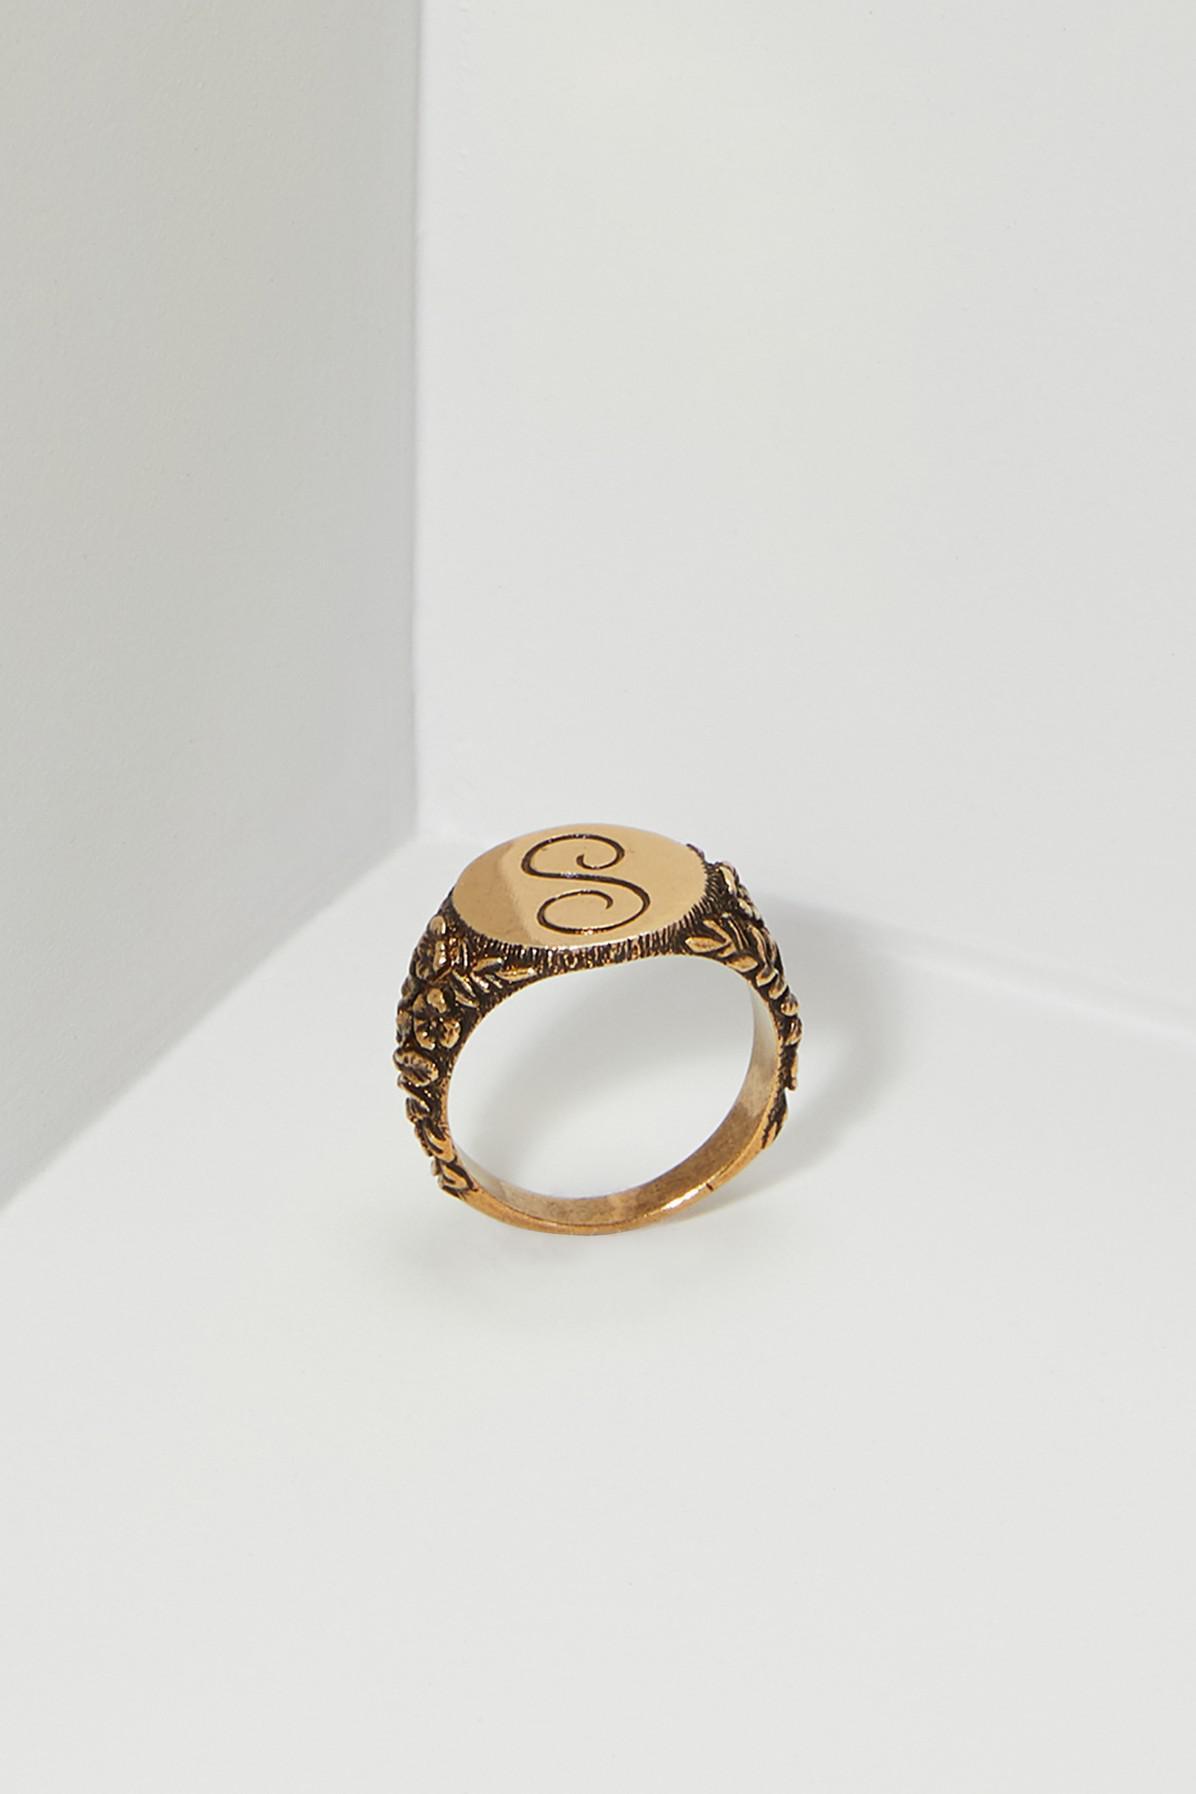 Stella McCartney Brass Ring in Metallic